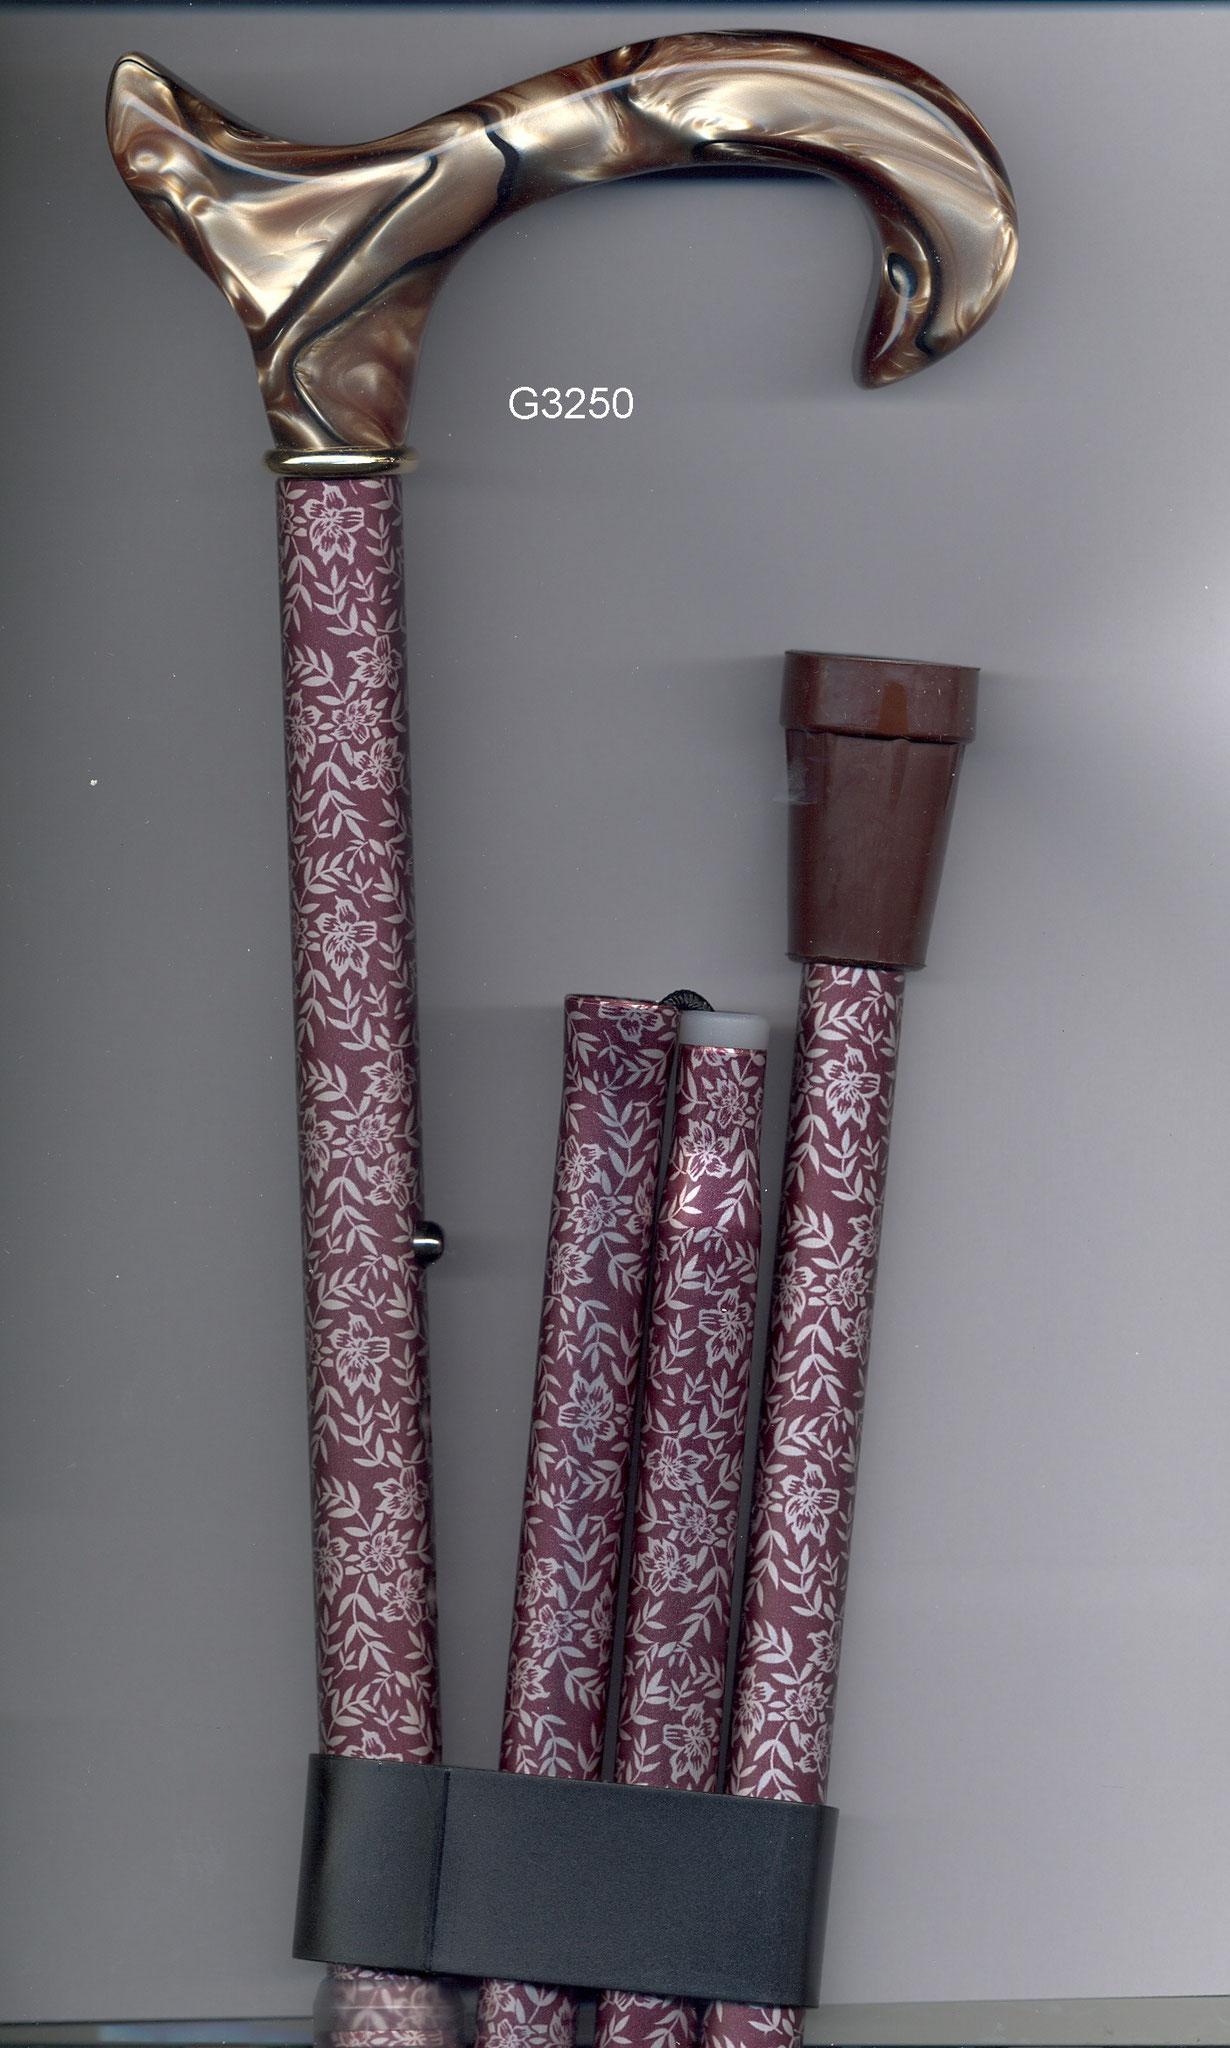 G3250 Béquille pliante alu poignée grise marbrée tube brun fleuri